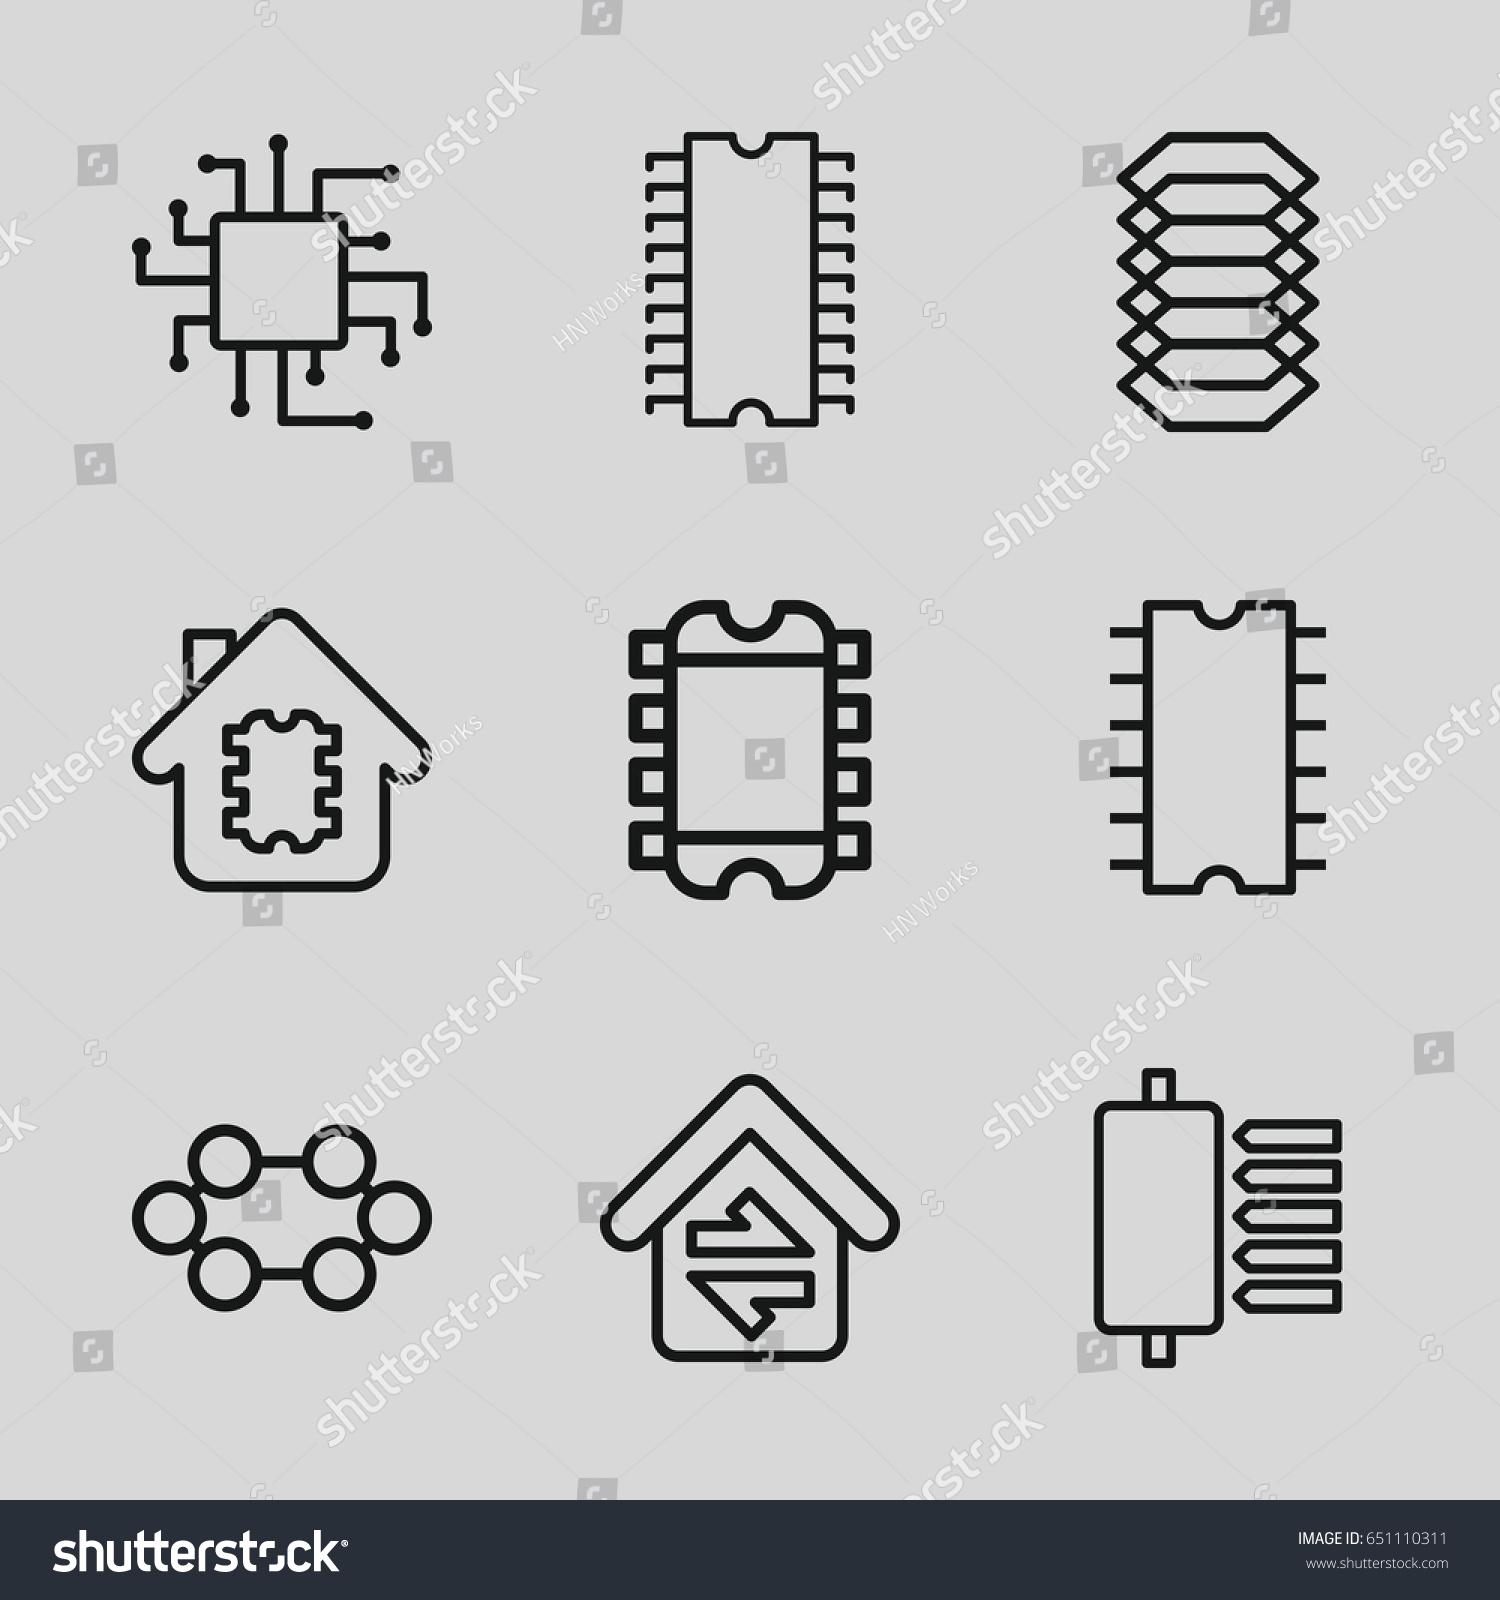 Circuit Icons Set Set 9 Circuit Stock Vector 651110311 - Shutterstock